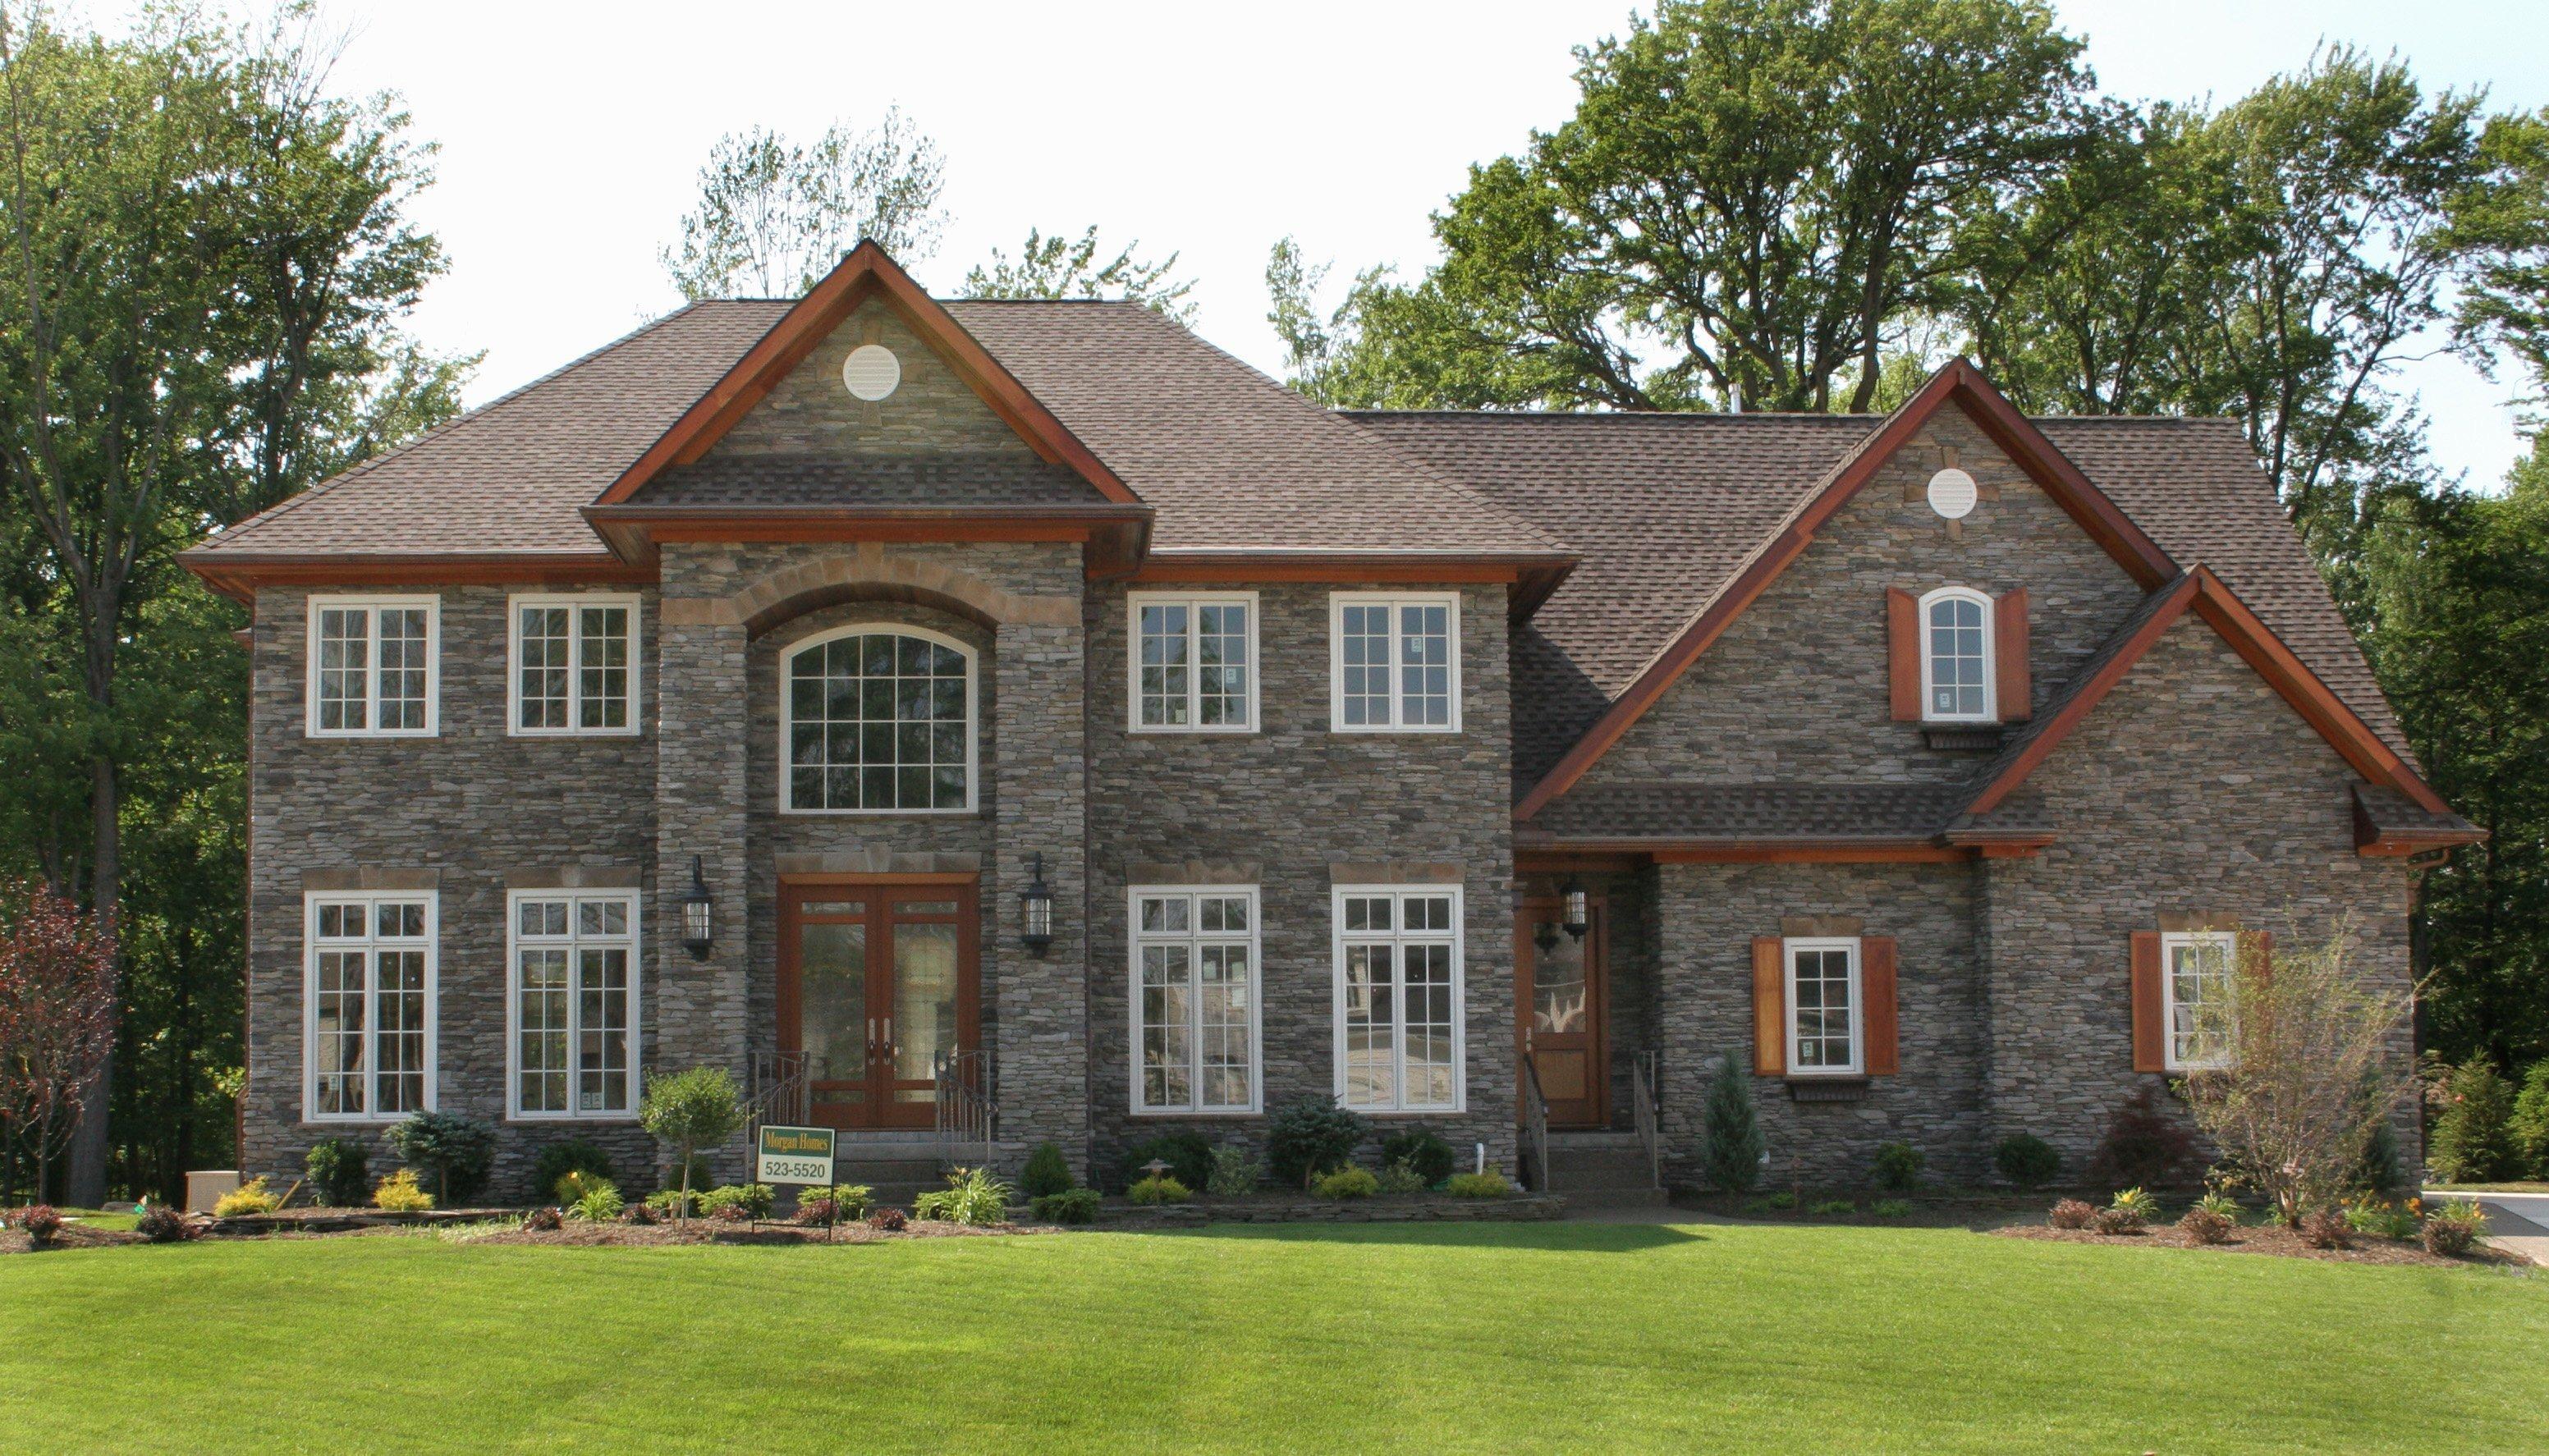 Custom Home Builders - Clarence, Amherst & Buffalo, NY